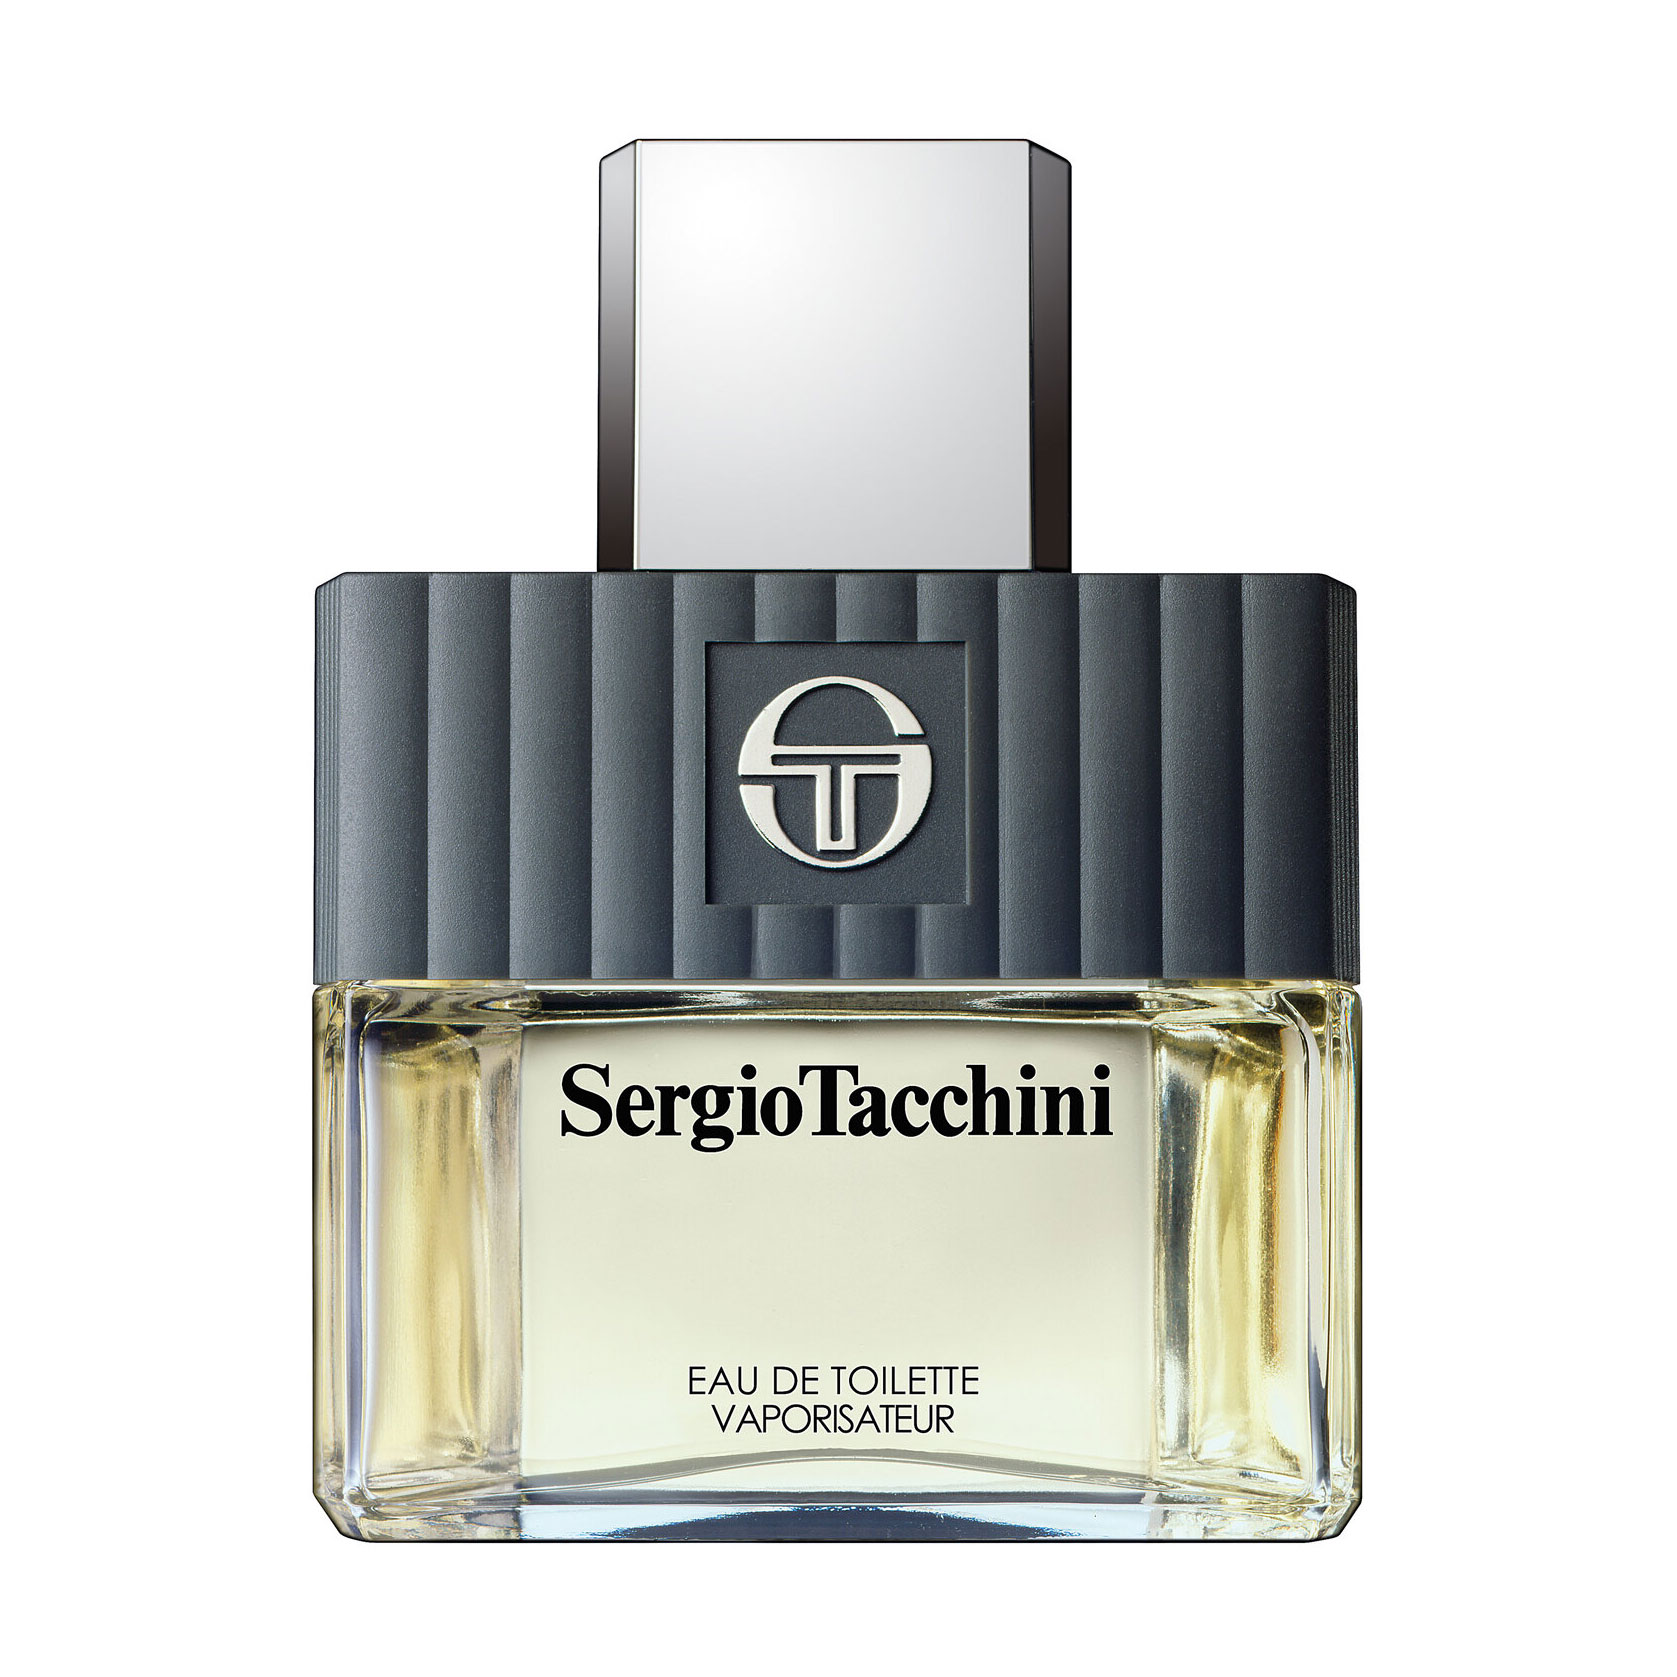 Sergio Tacchini Eau De Toilette Туалетна вода чоловіча, 100 мл (ТЕСТЕР з кришкою)